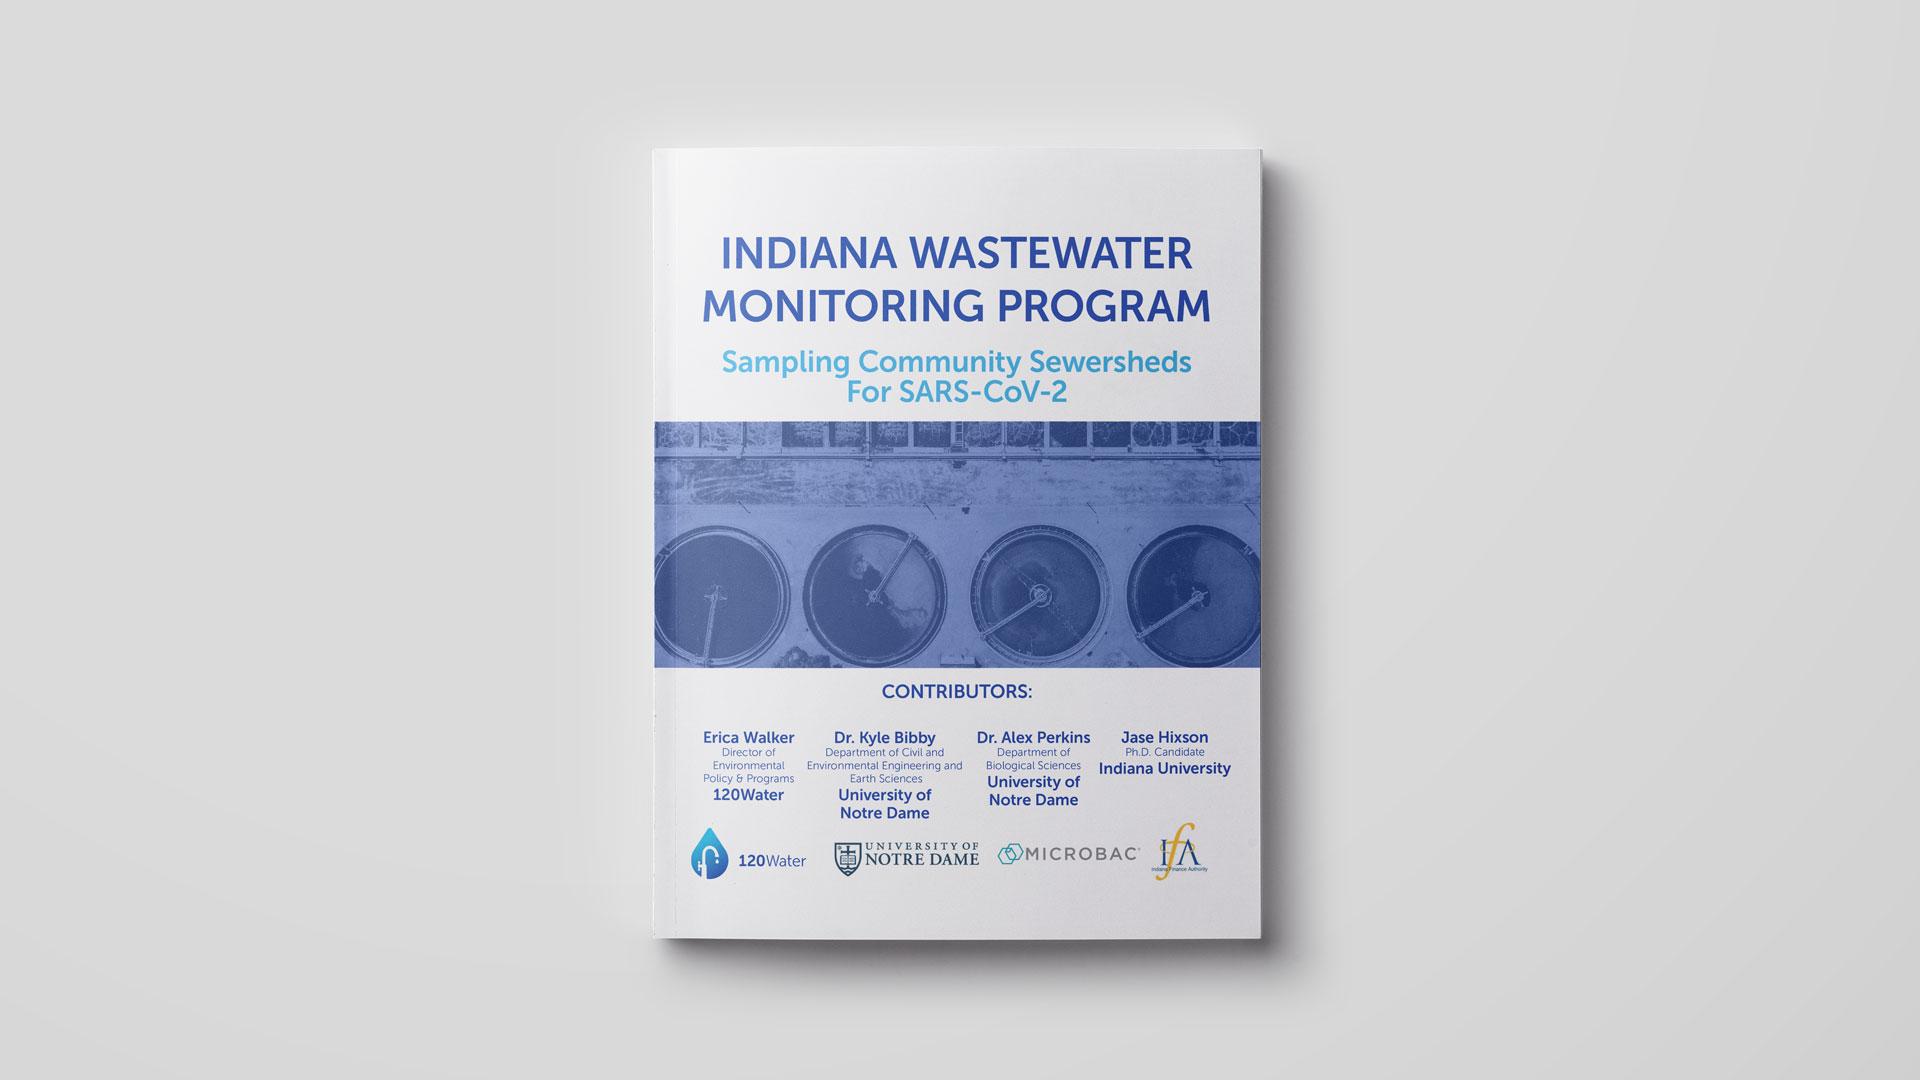 [Report] Indiana Wastewater Monitoring Program